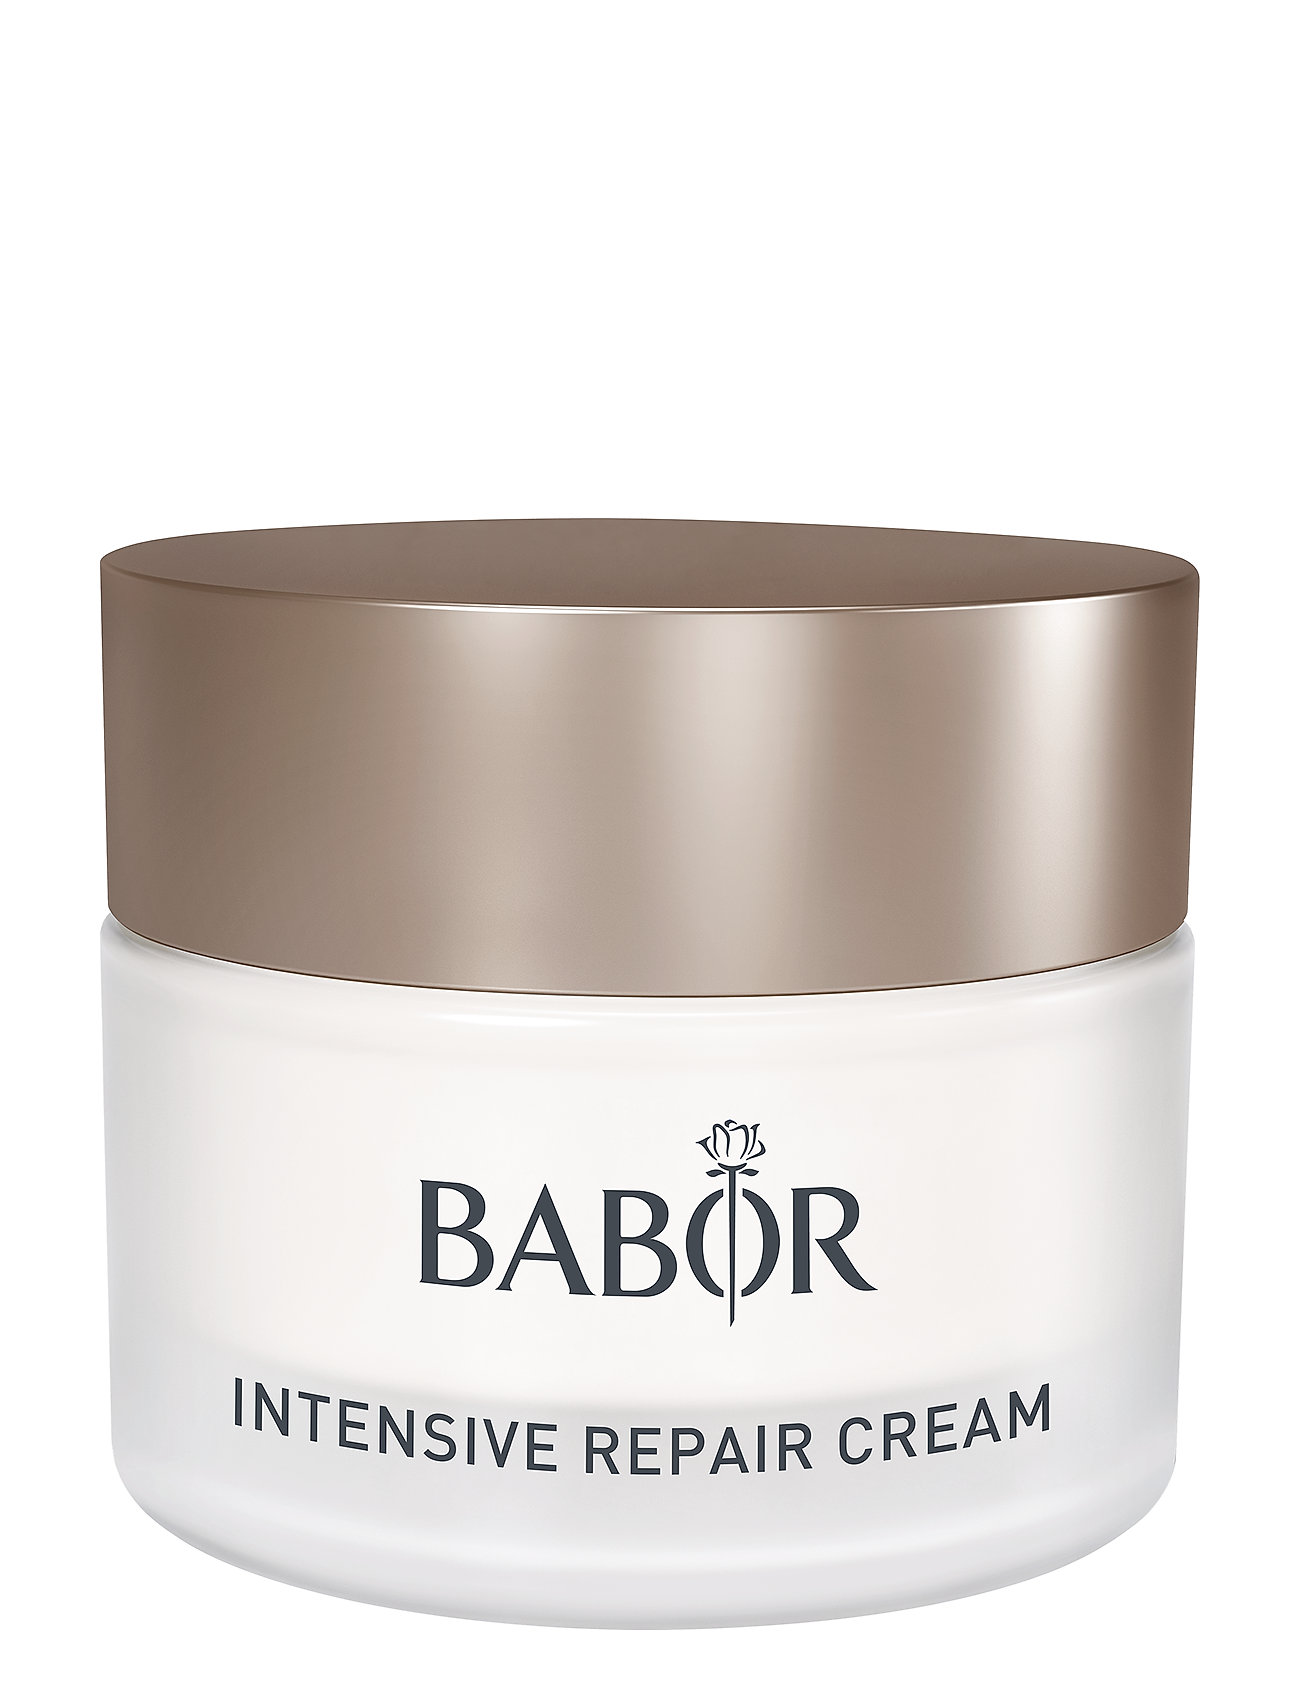 Babor Intensive Repair Cream - NO COLOR